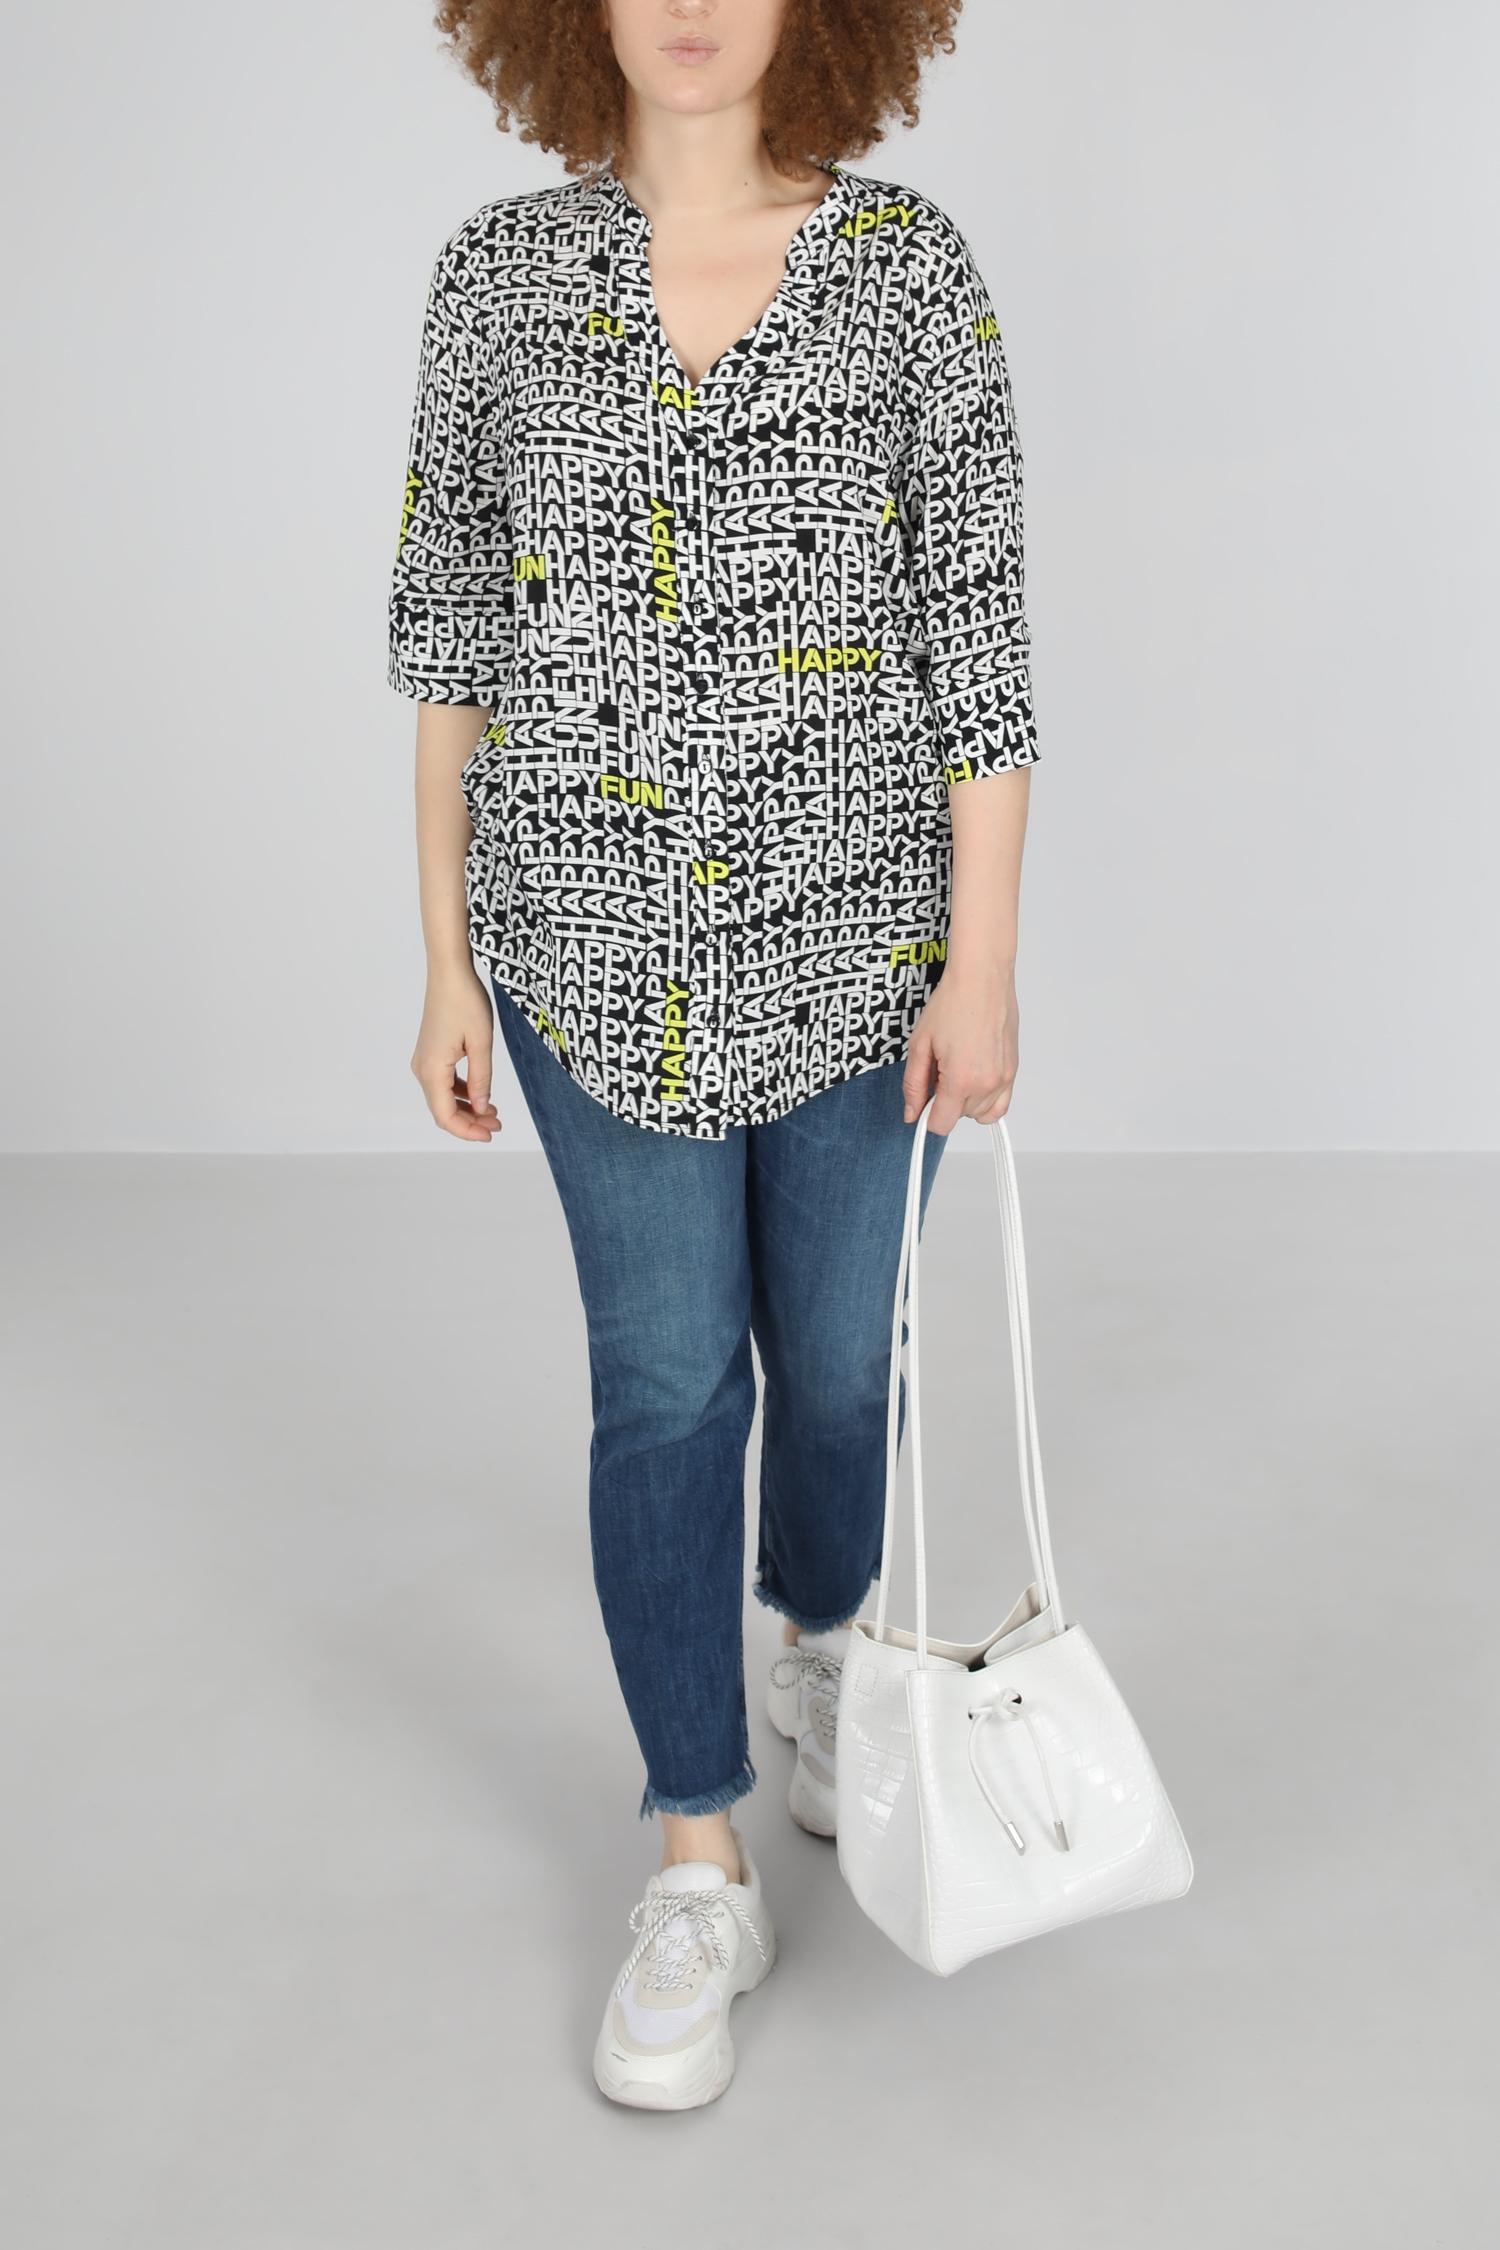 Mao collar straight shirt